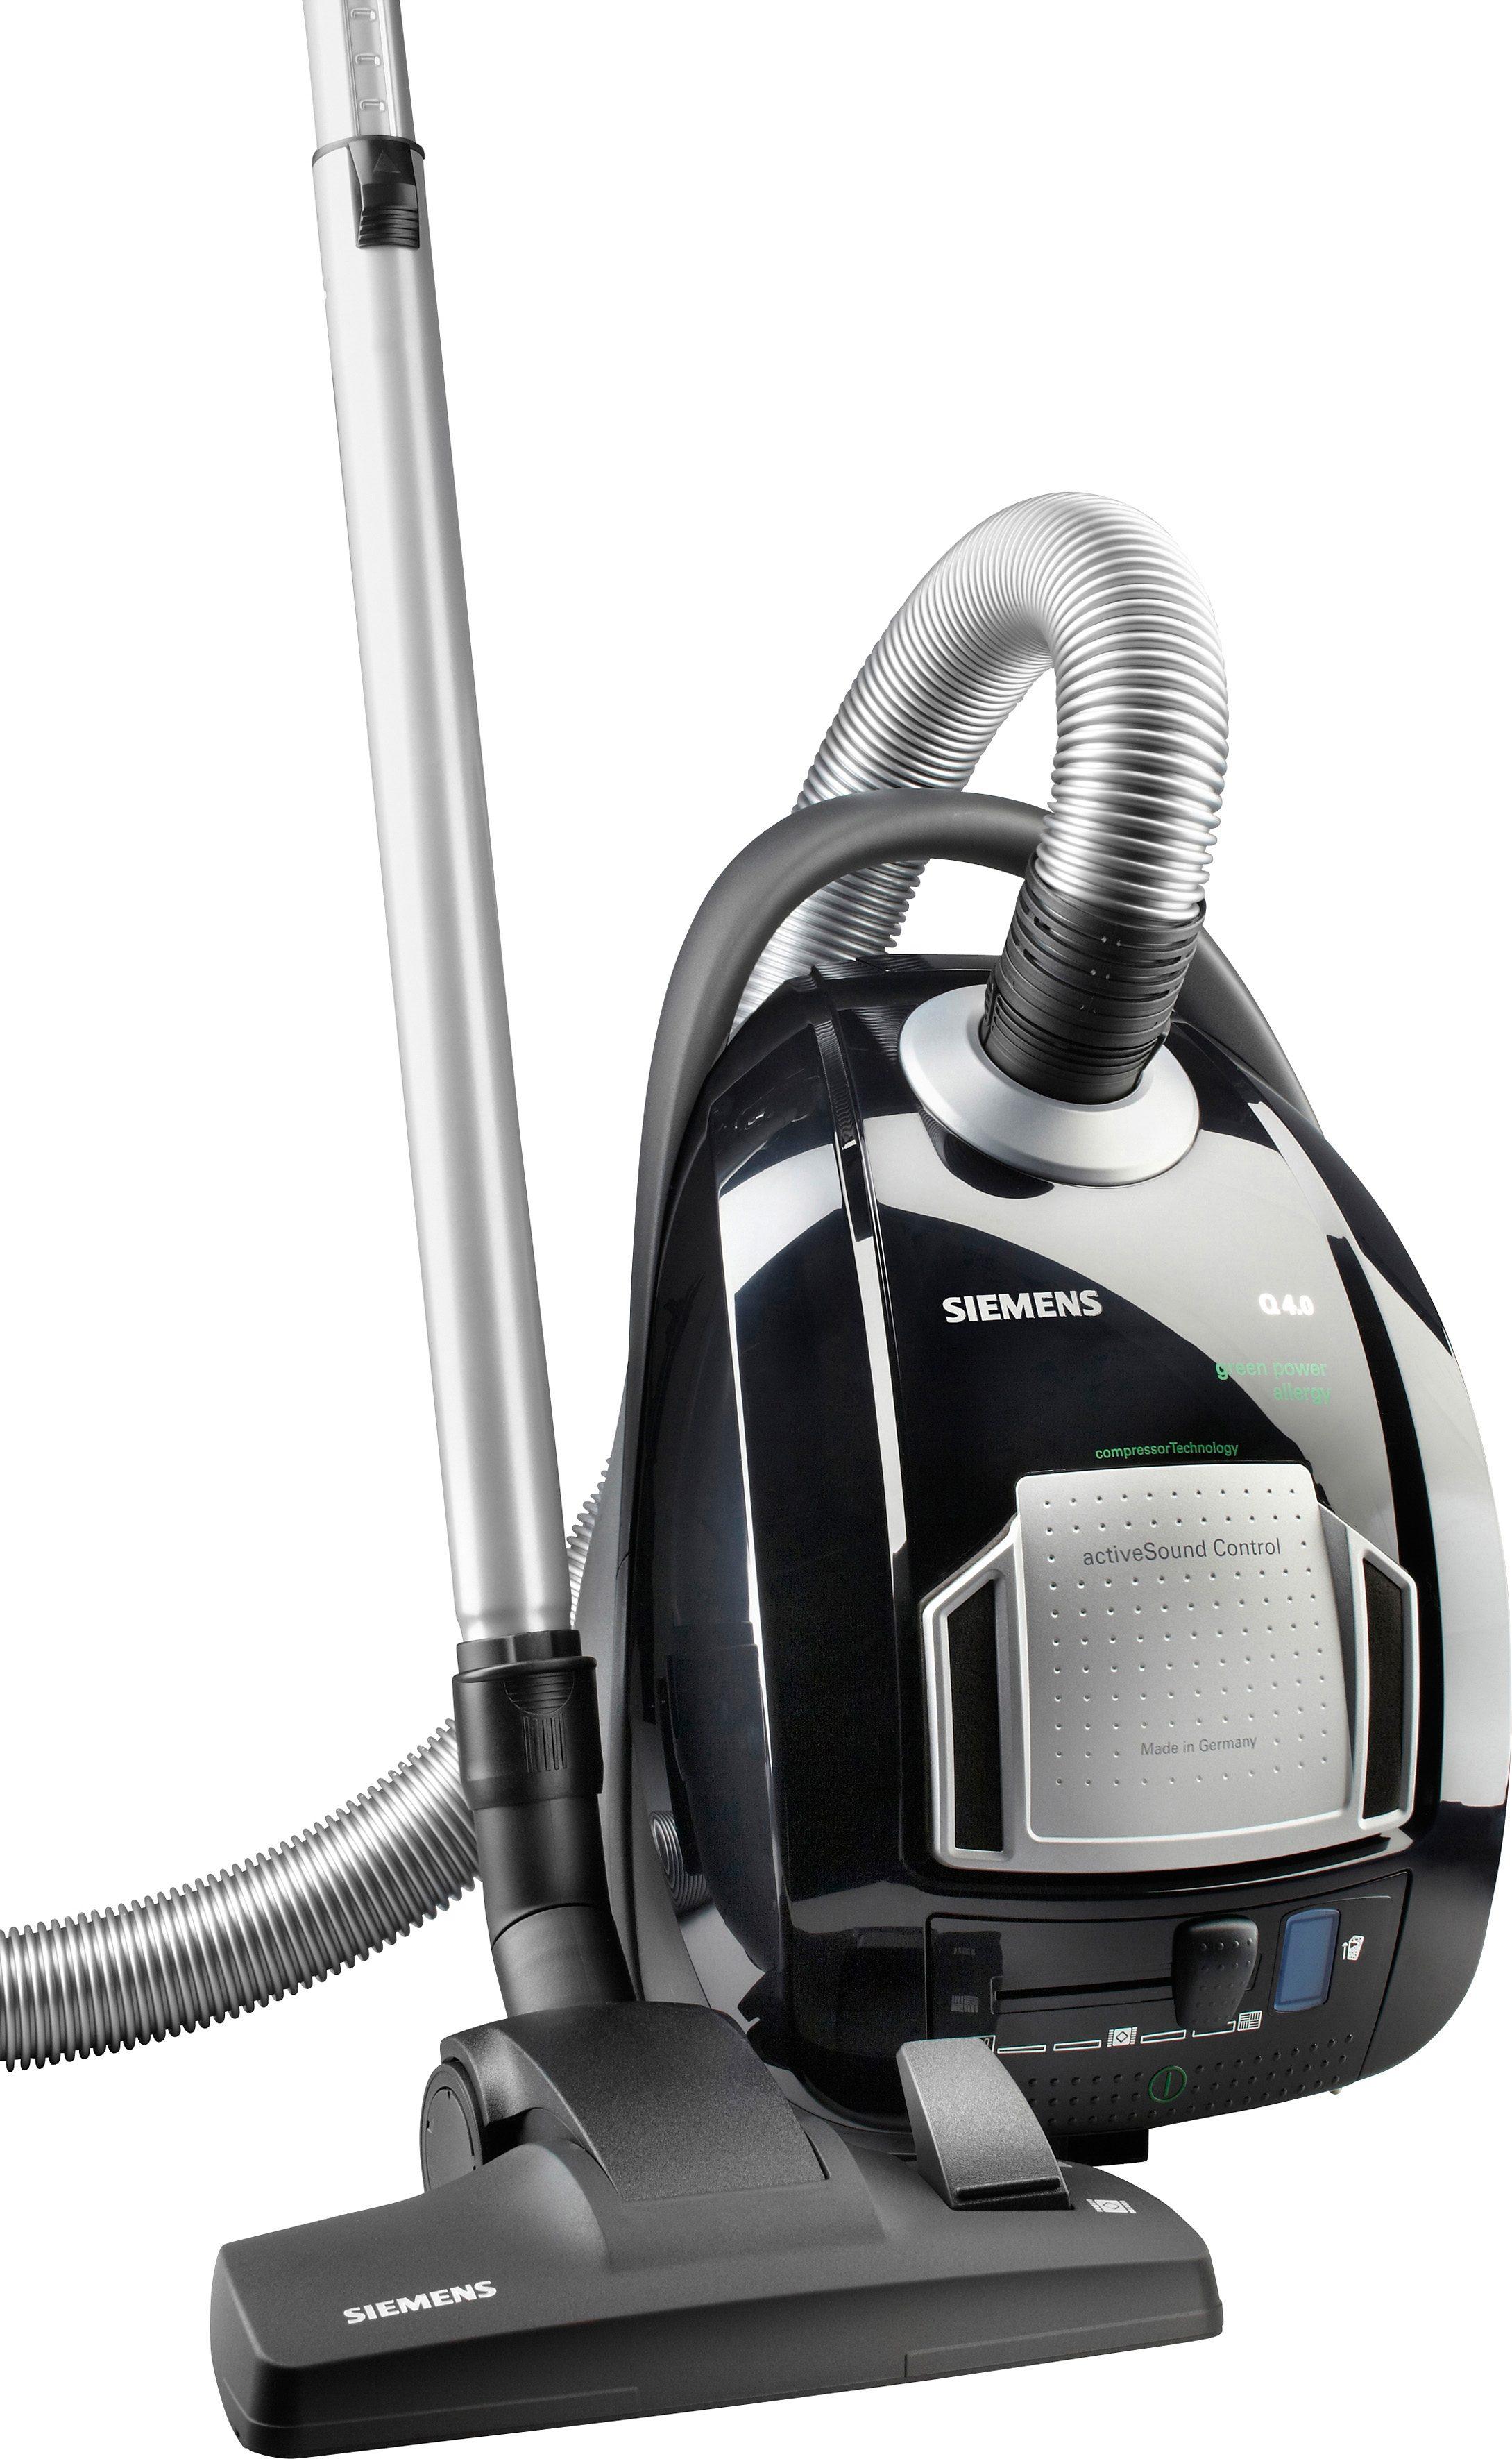 Siemens Staubsauger VSQ4GP1264 Q 4.0 green power allergy, made in Germany